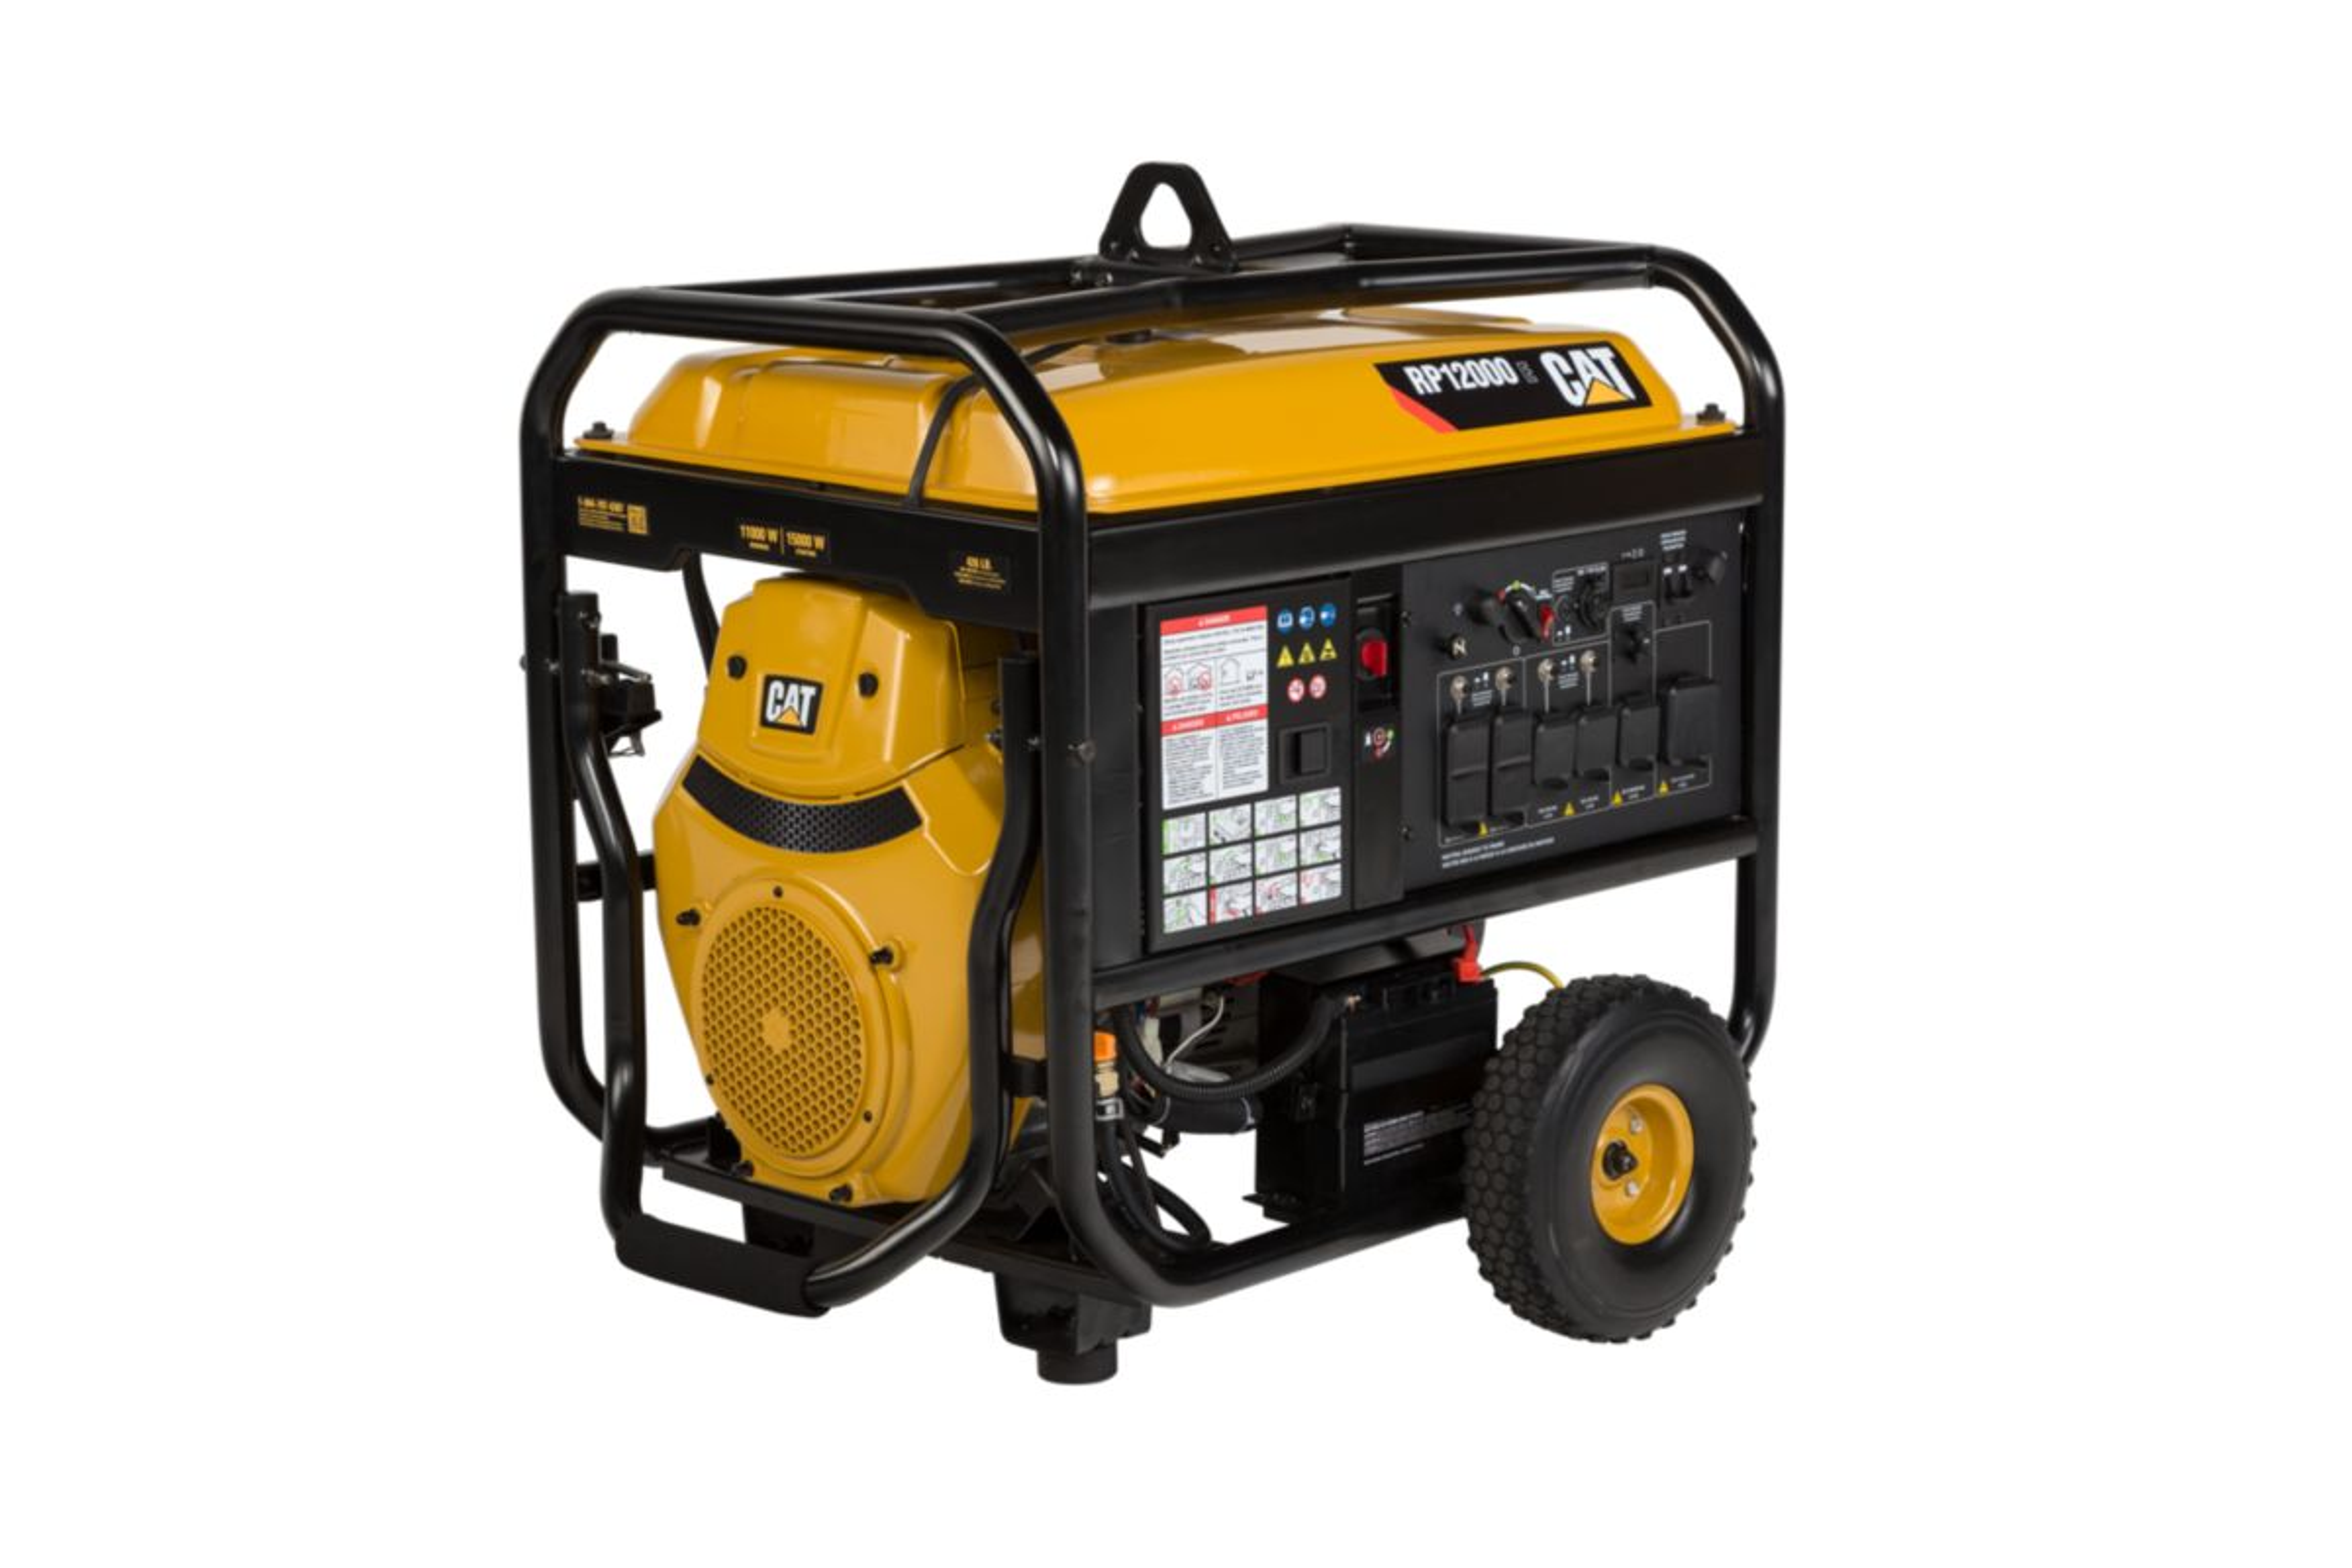 Cat | Introducing the 12000E Portable Generator | Caterpillar